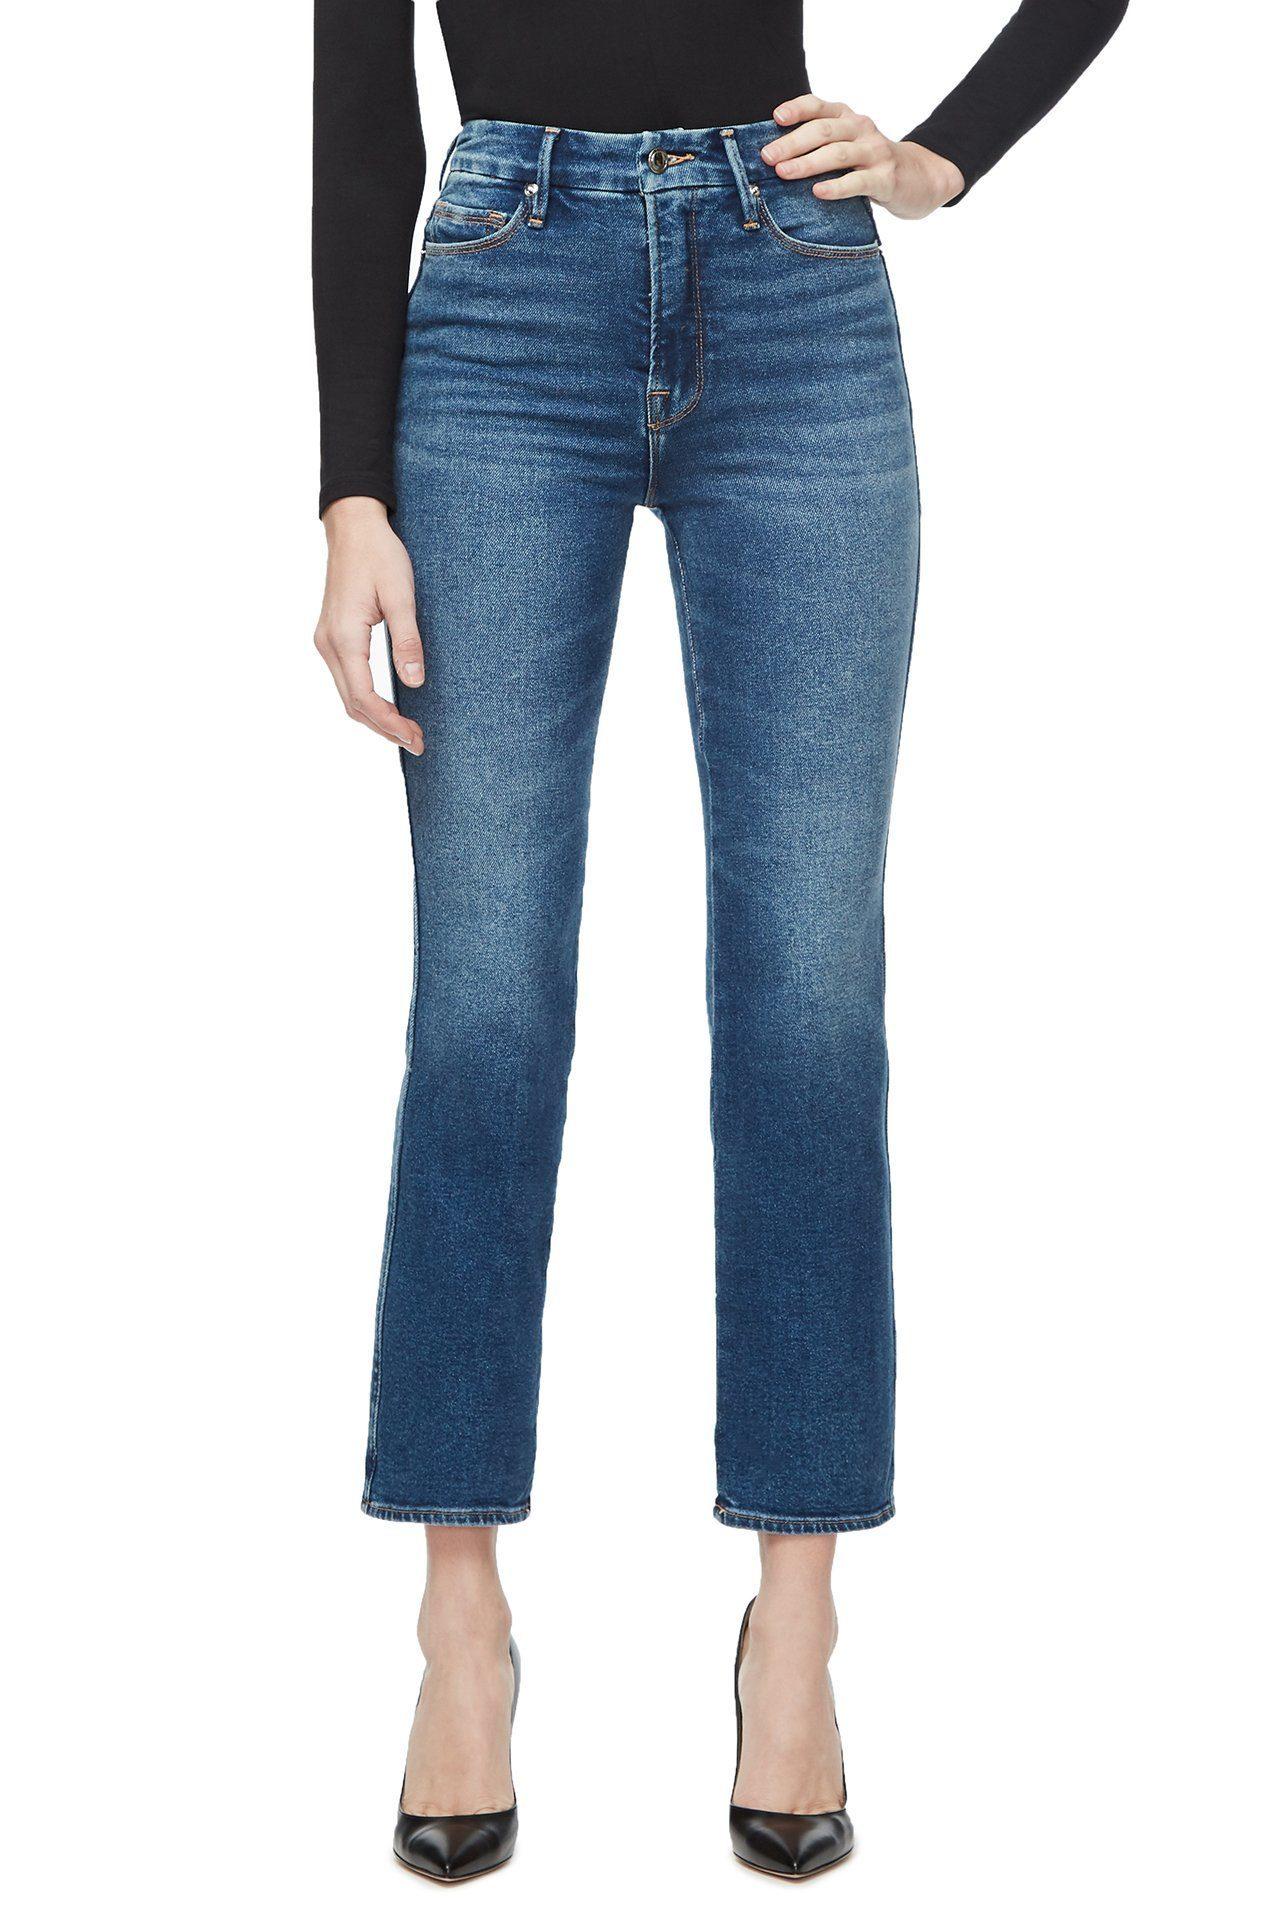 STYLECASTER | Hailey Bieber Levis Jeans